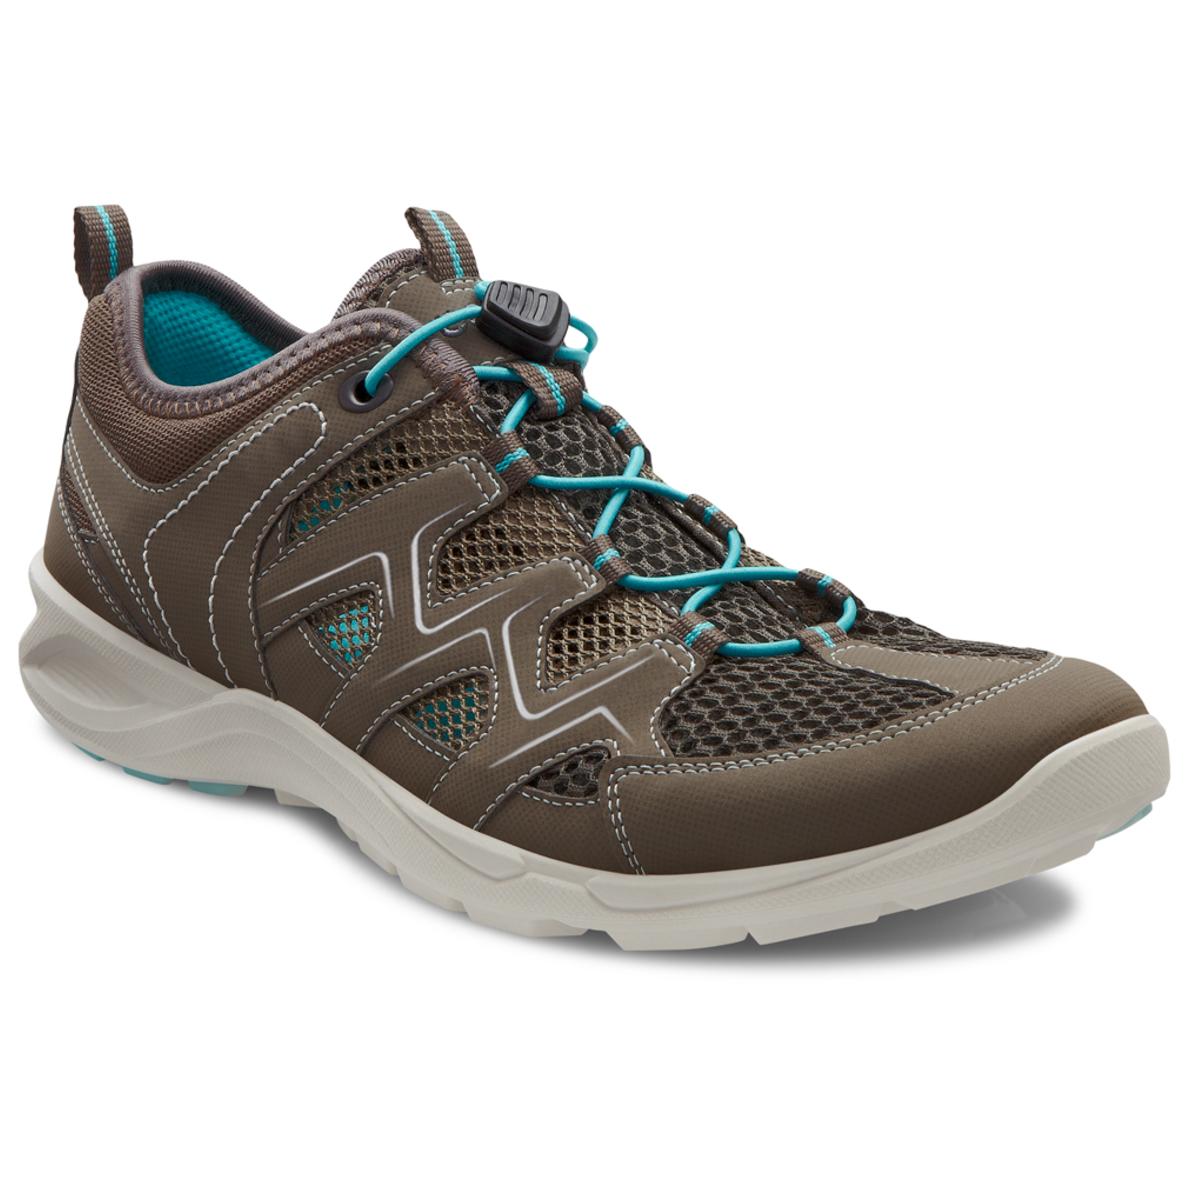 Dark Ecco Multisports Turquoise37eu Terracruise Chaussures Lt Women's Clay Grey Warm FJ5l13uTKc